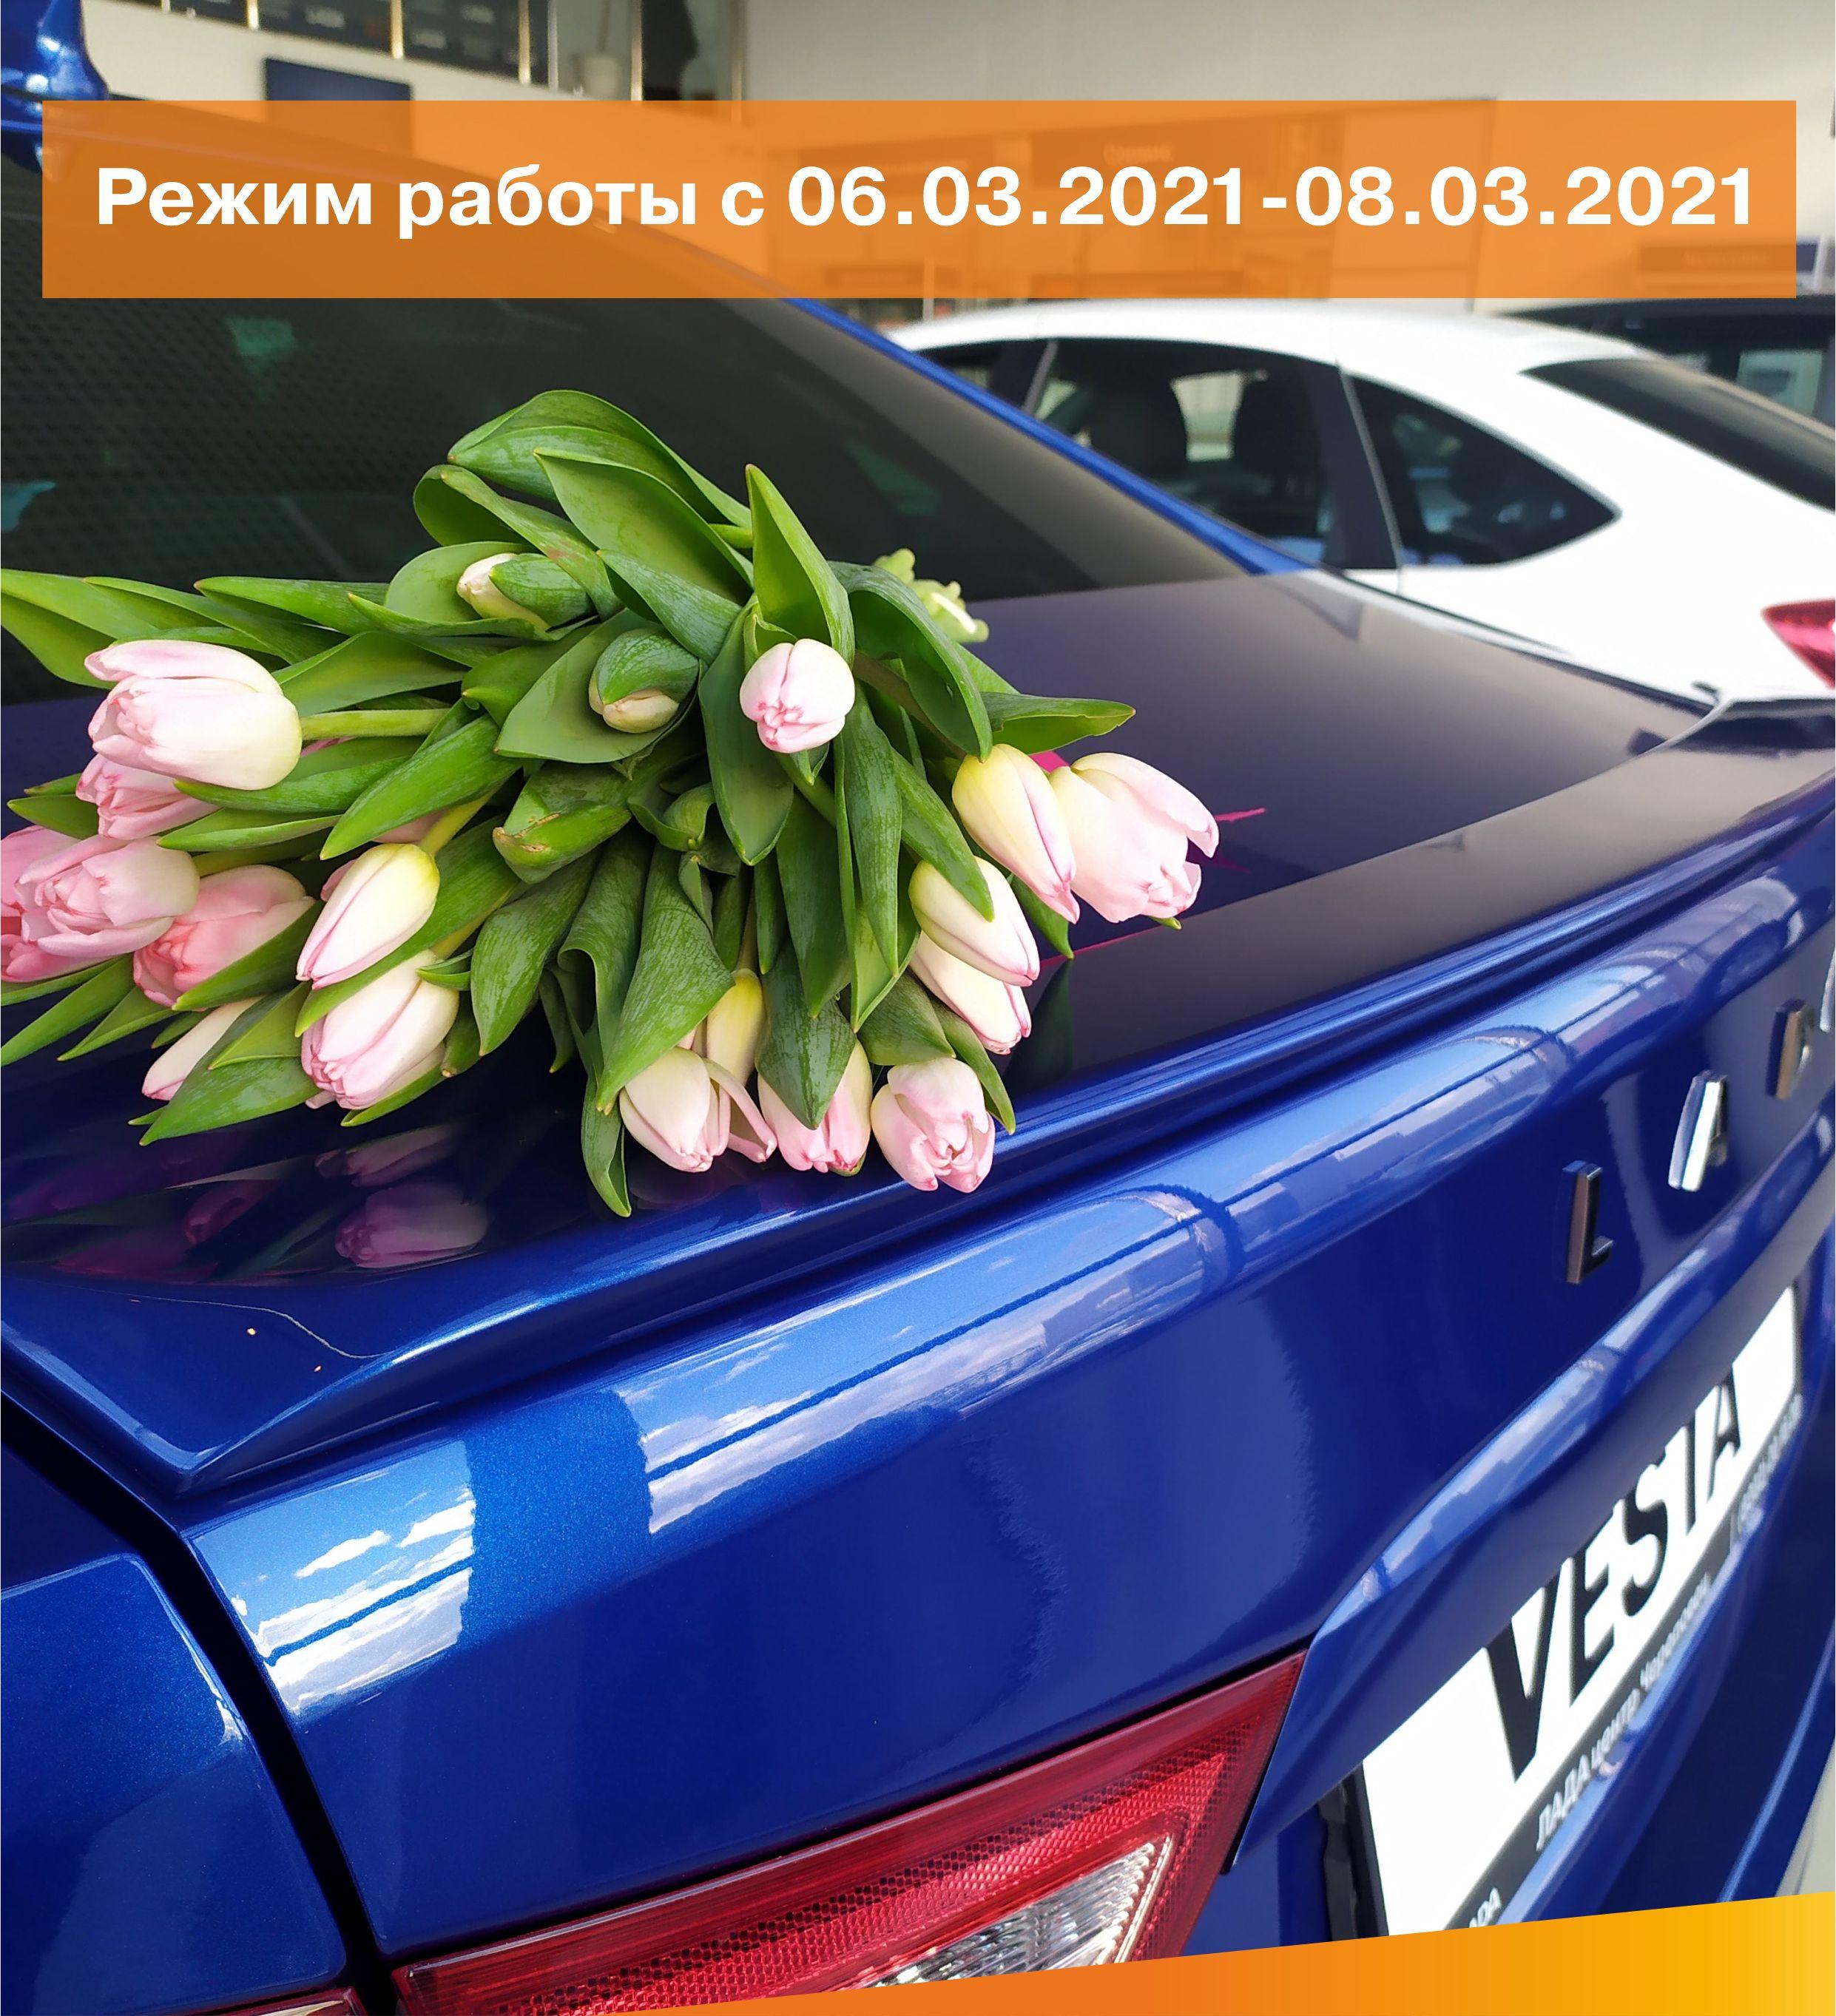 Режим работы ДЦ ''ЛАДА центр Череповец''  с 06.03.2021-08.03.2021